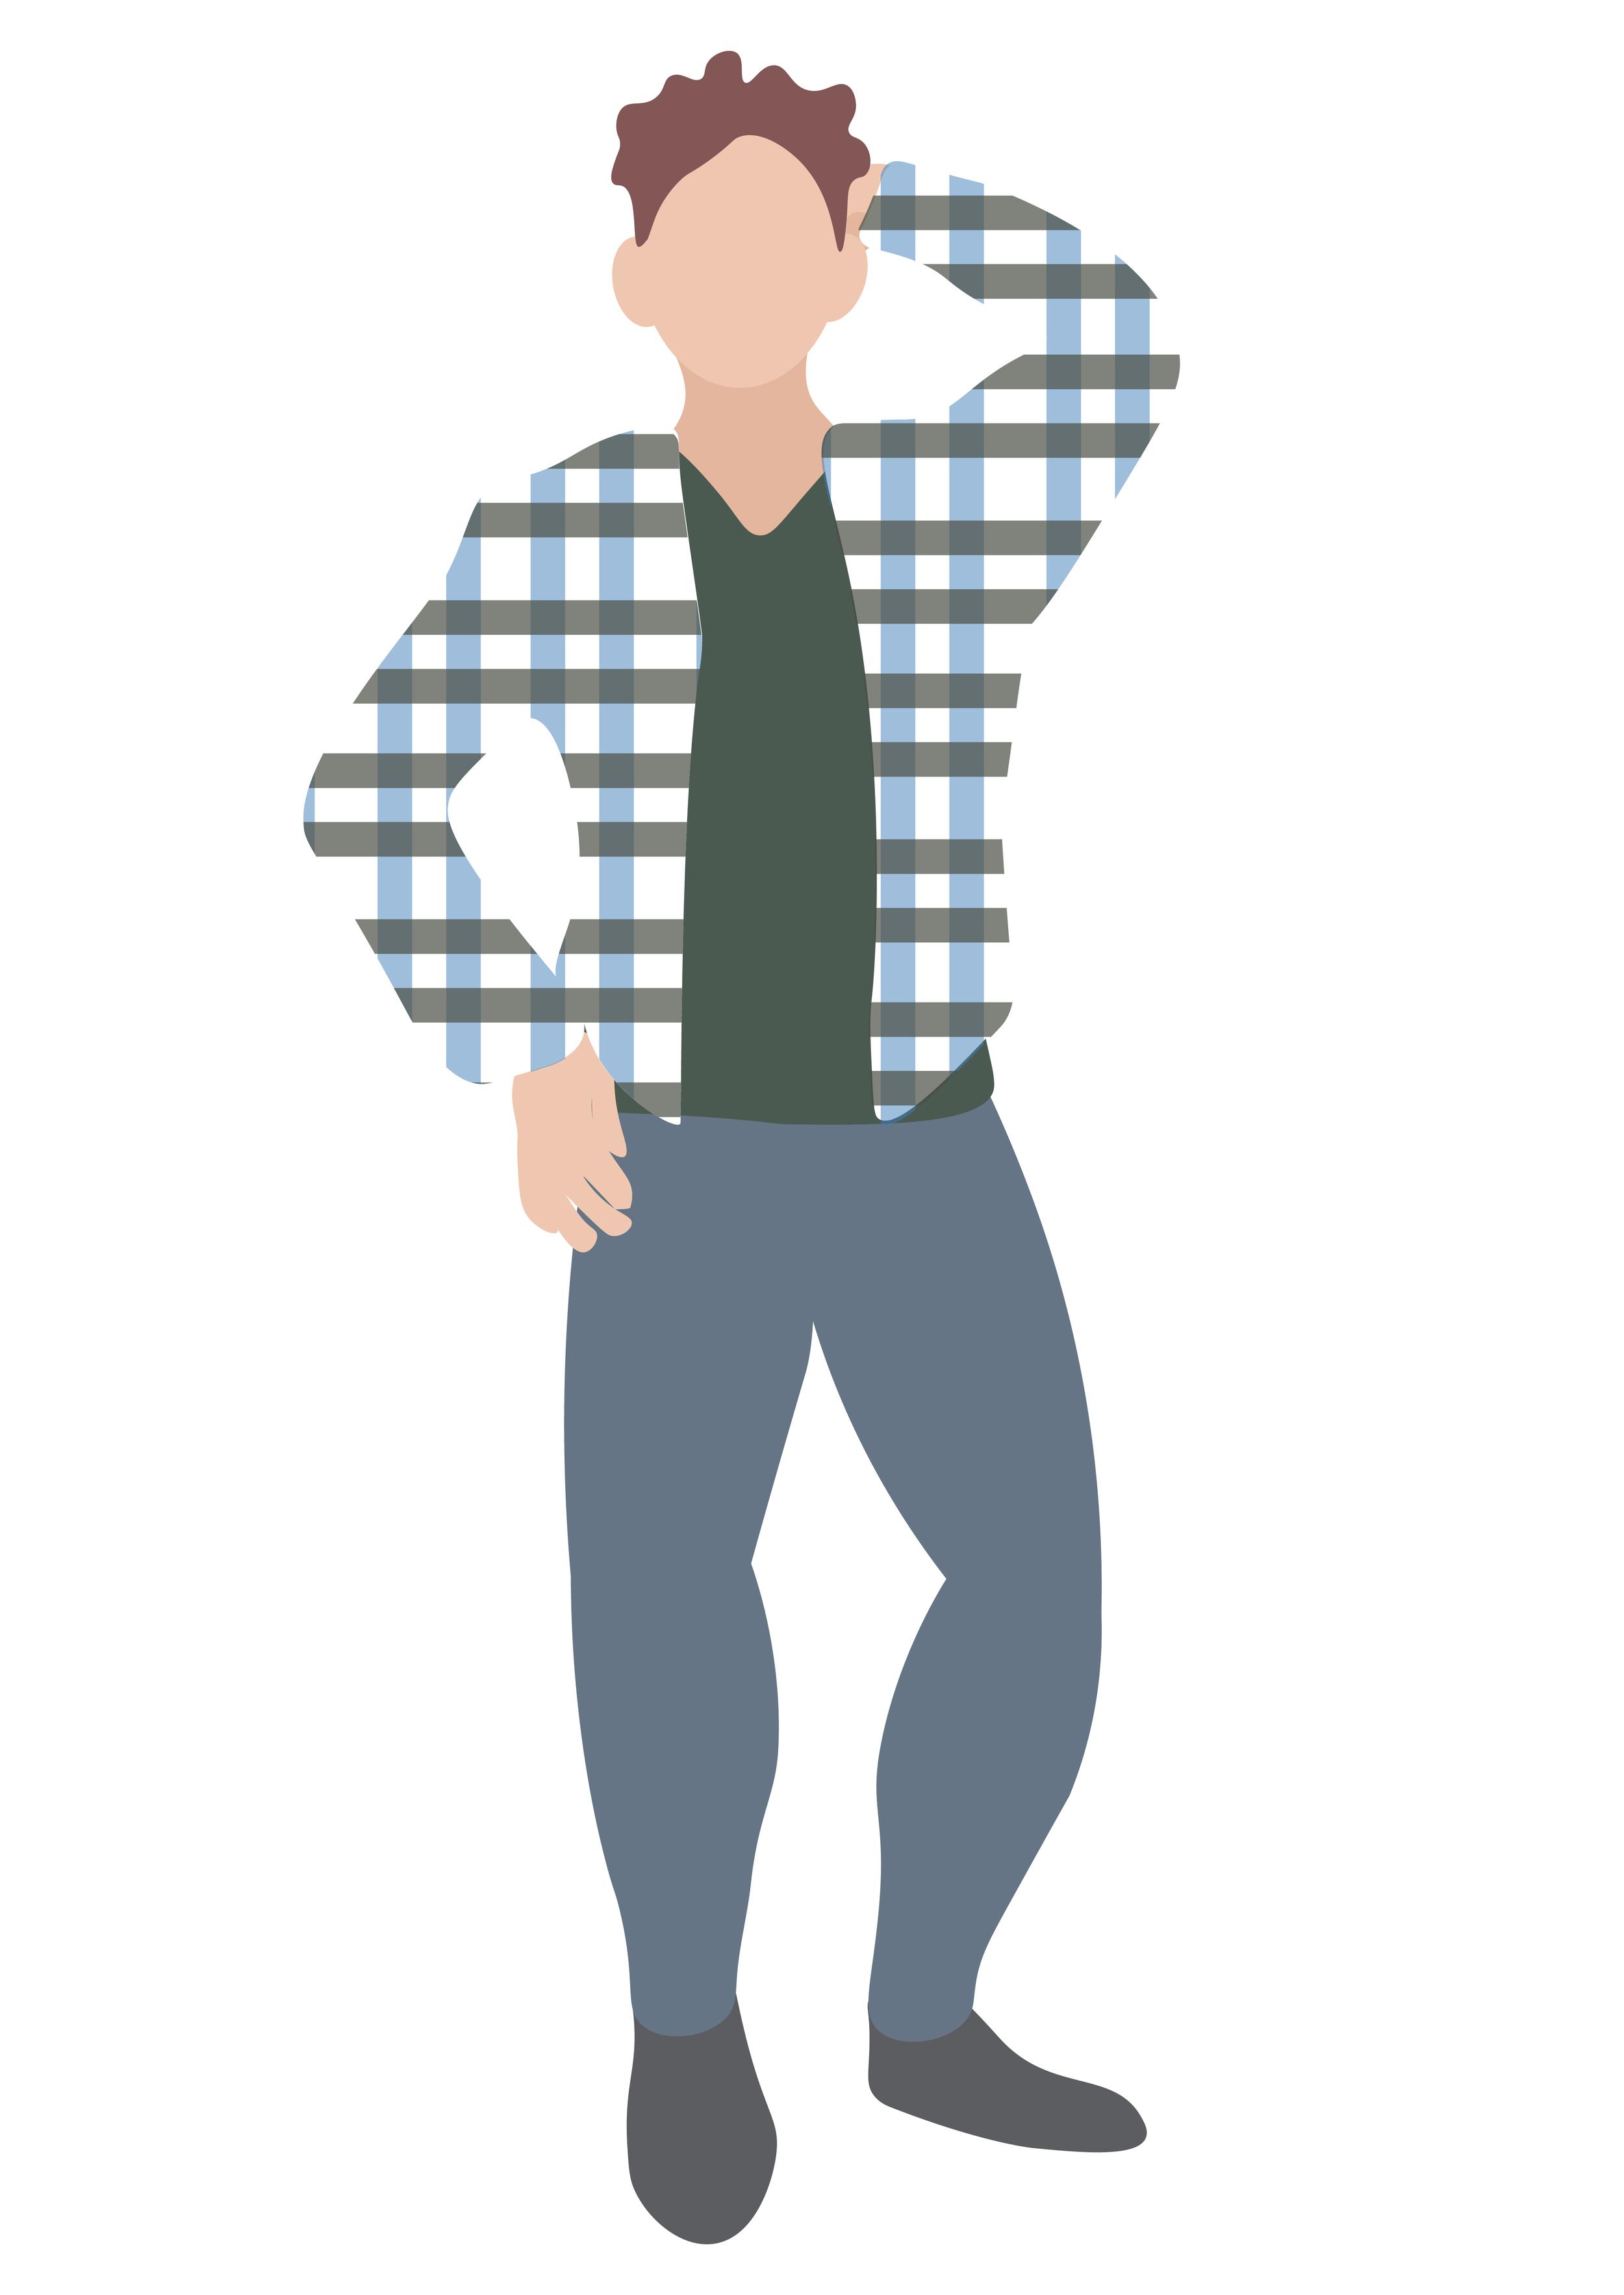 flat_illustrations-05.png